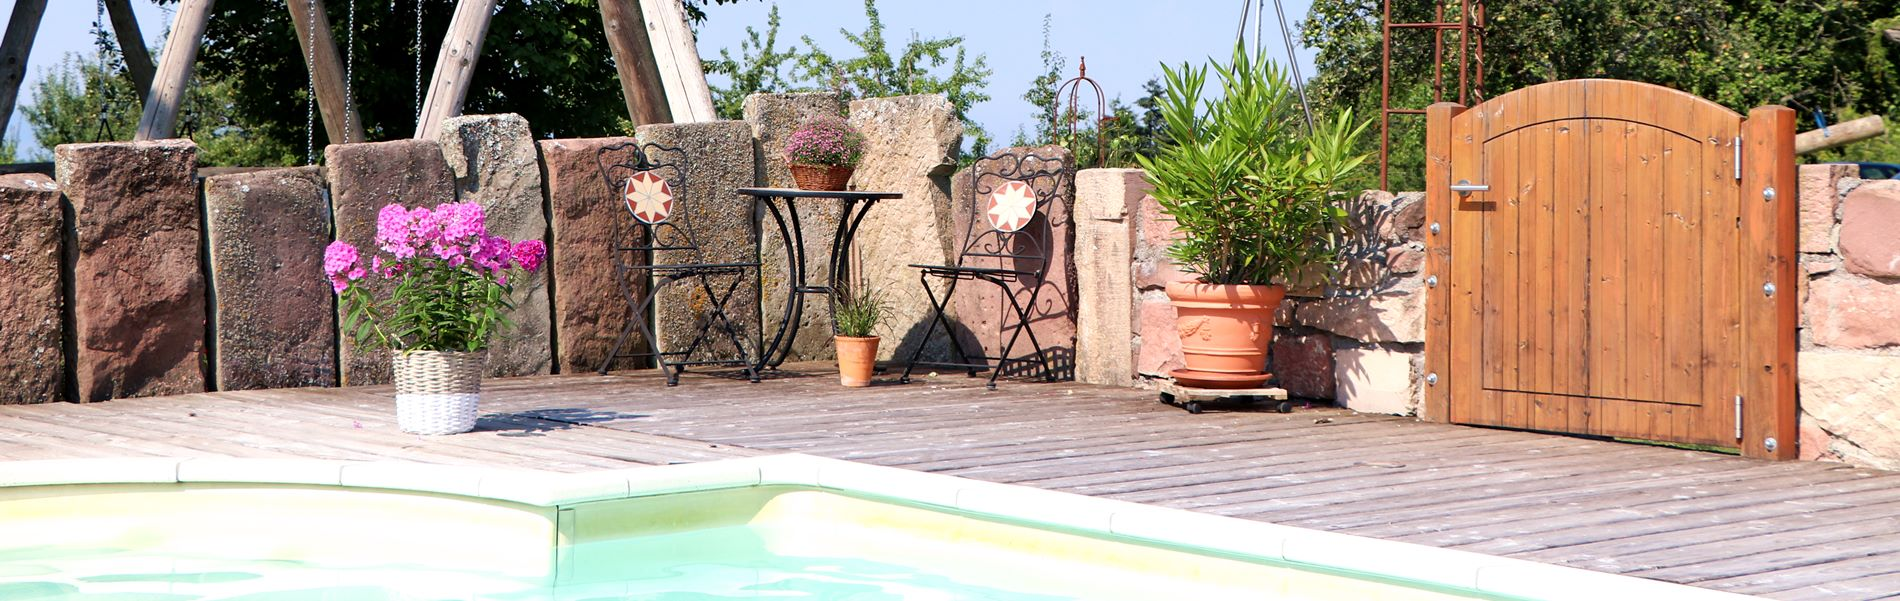 ferienhof-buehrer-pool